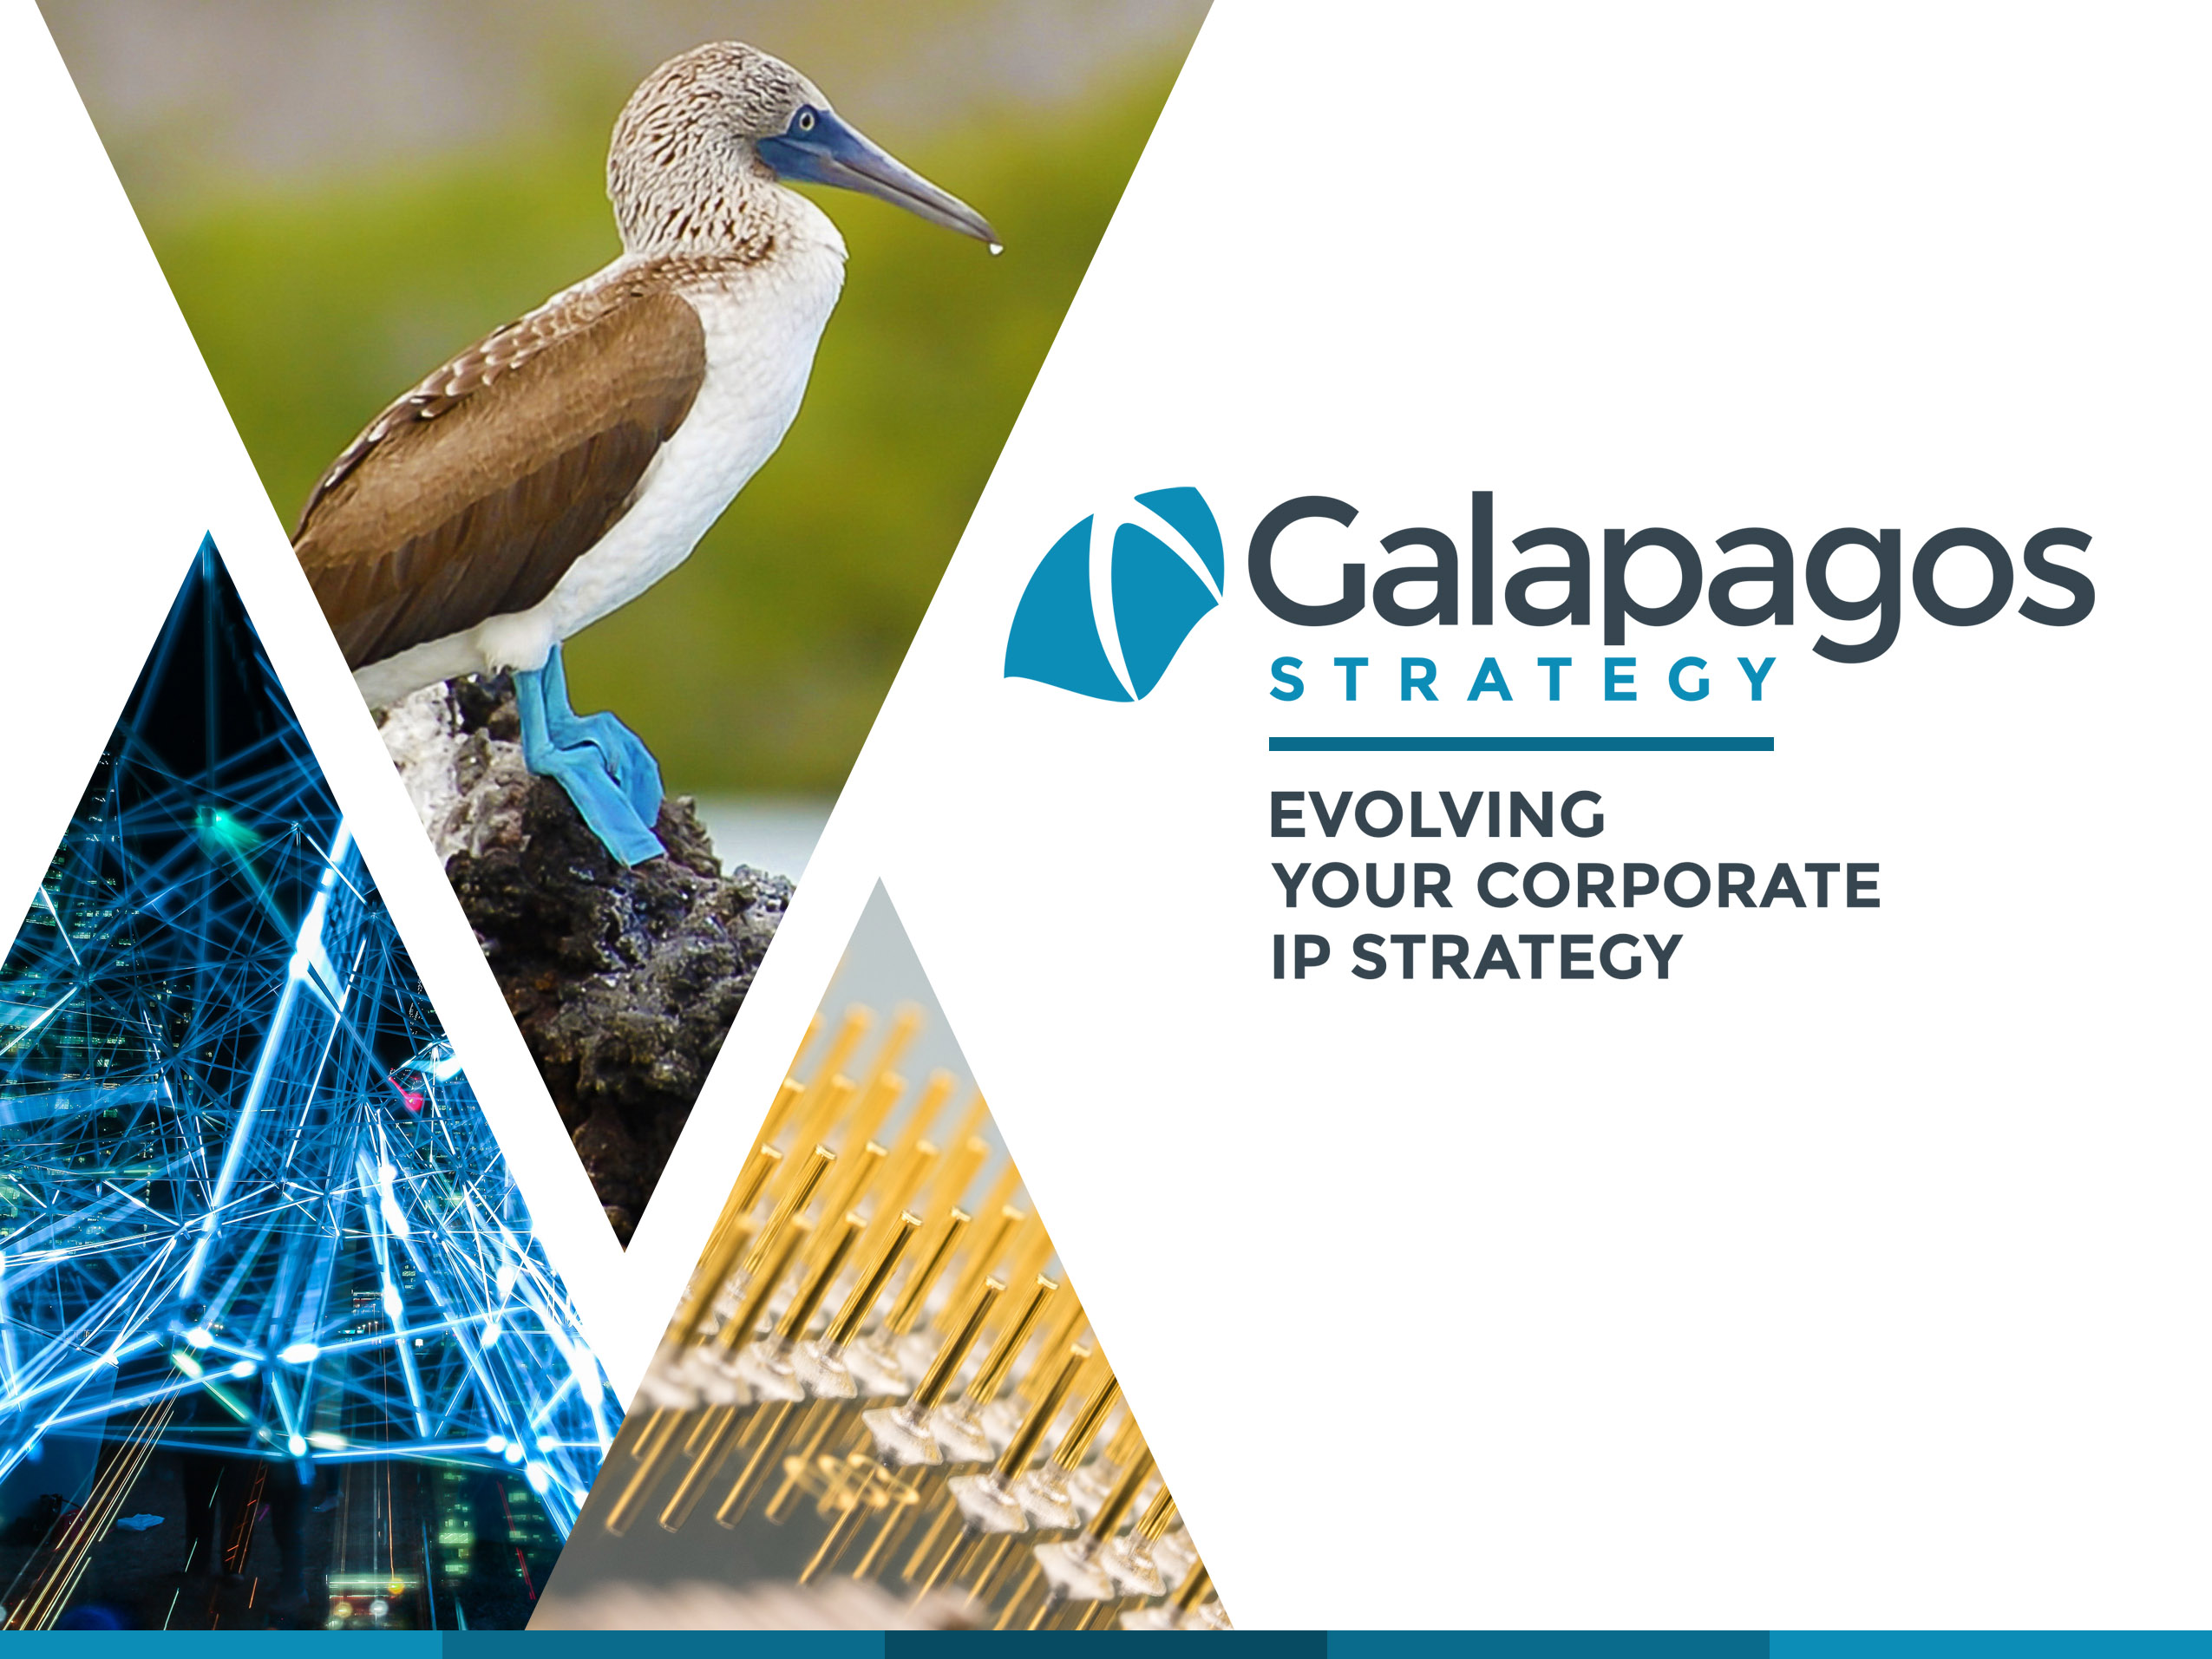 Galapagos Strategy